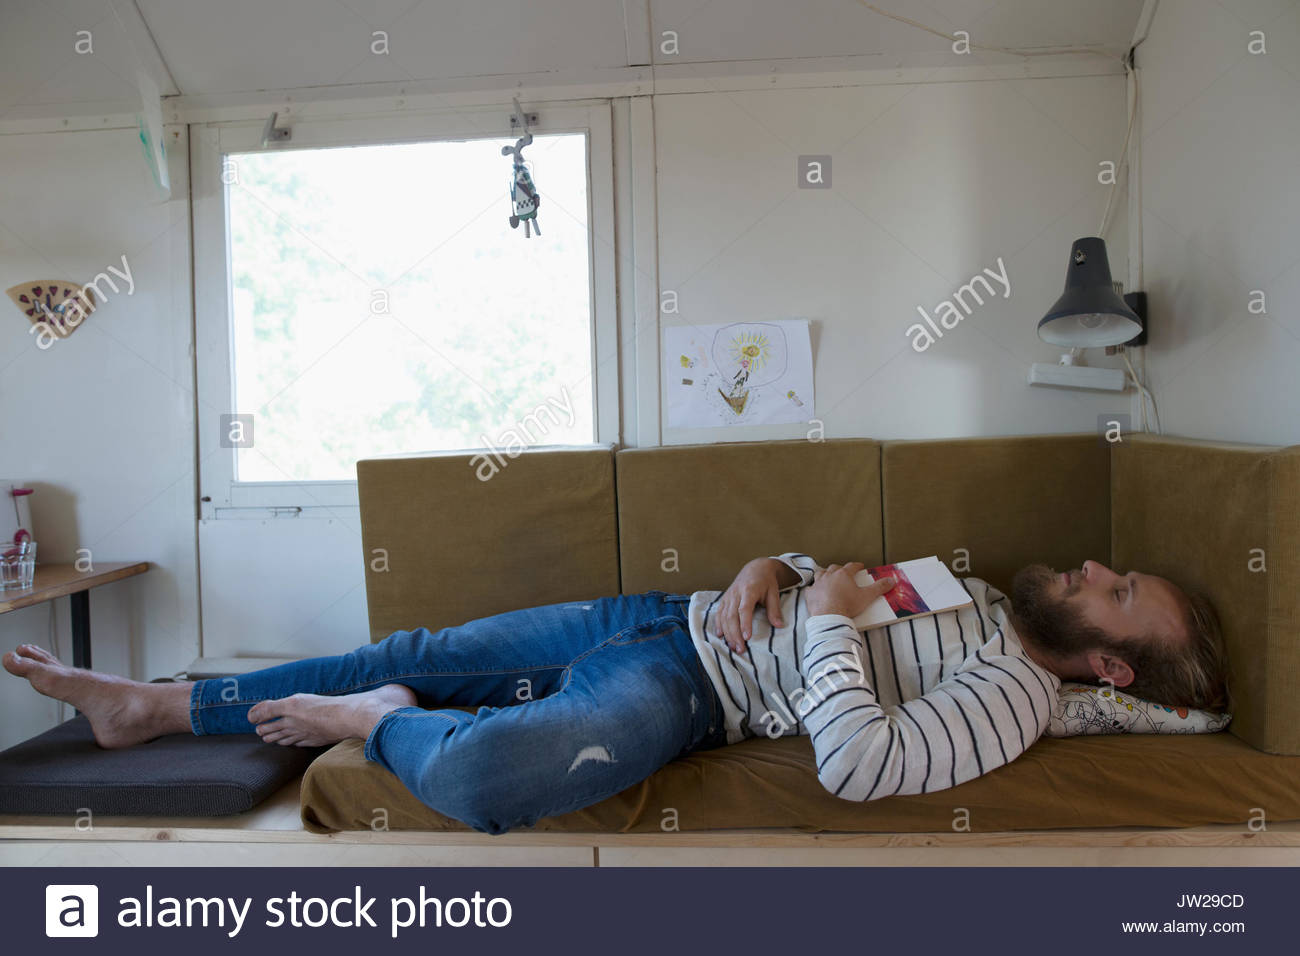 Tired, serene man with book sleeping on caravan bench - Stock Image